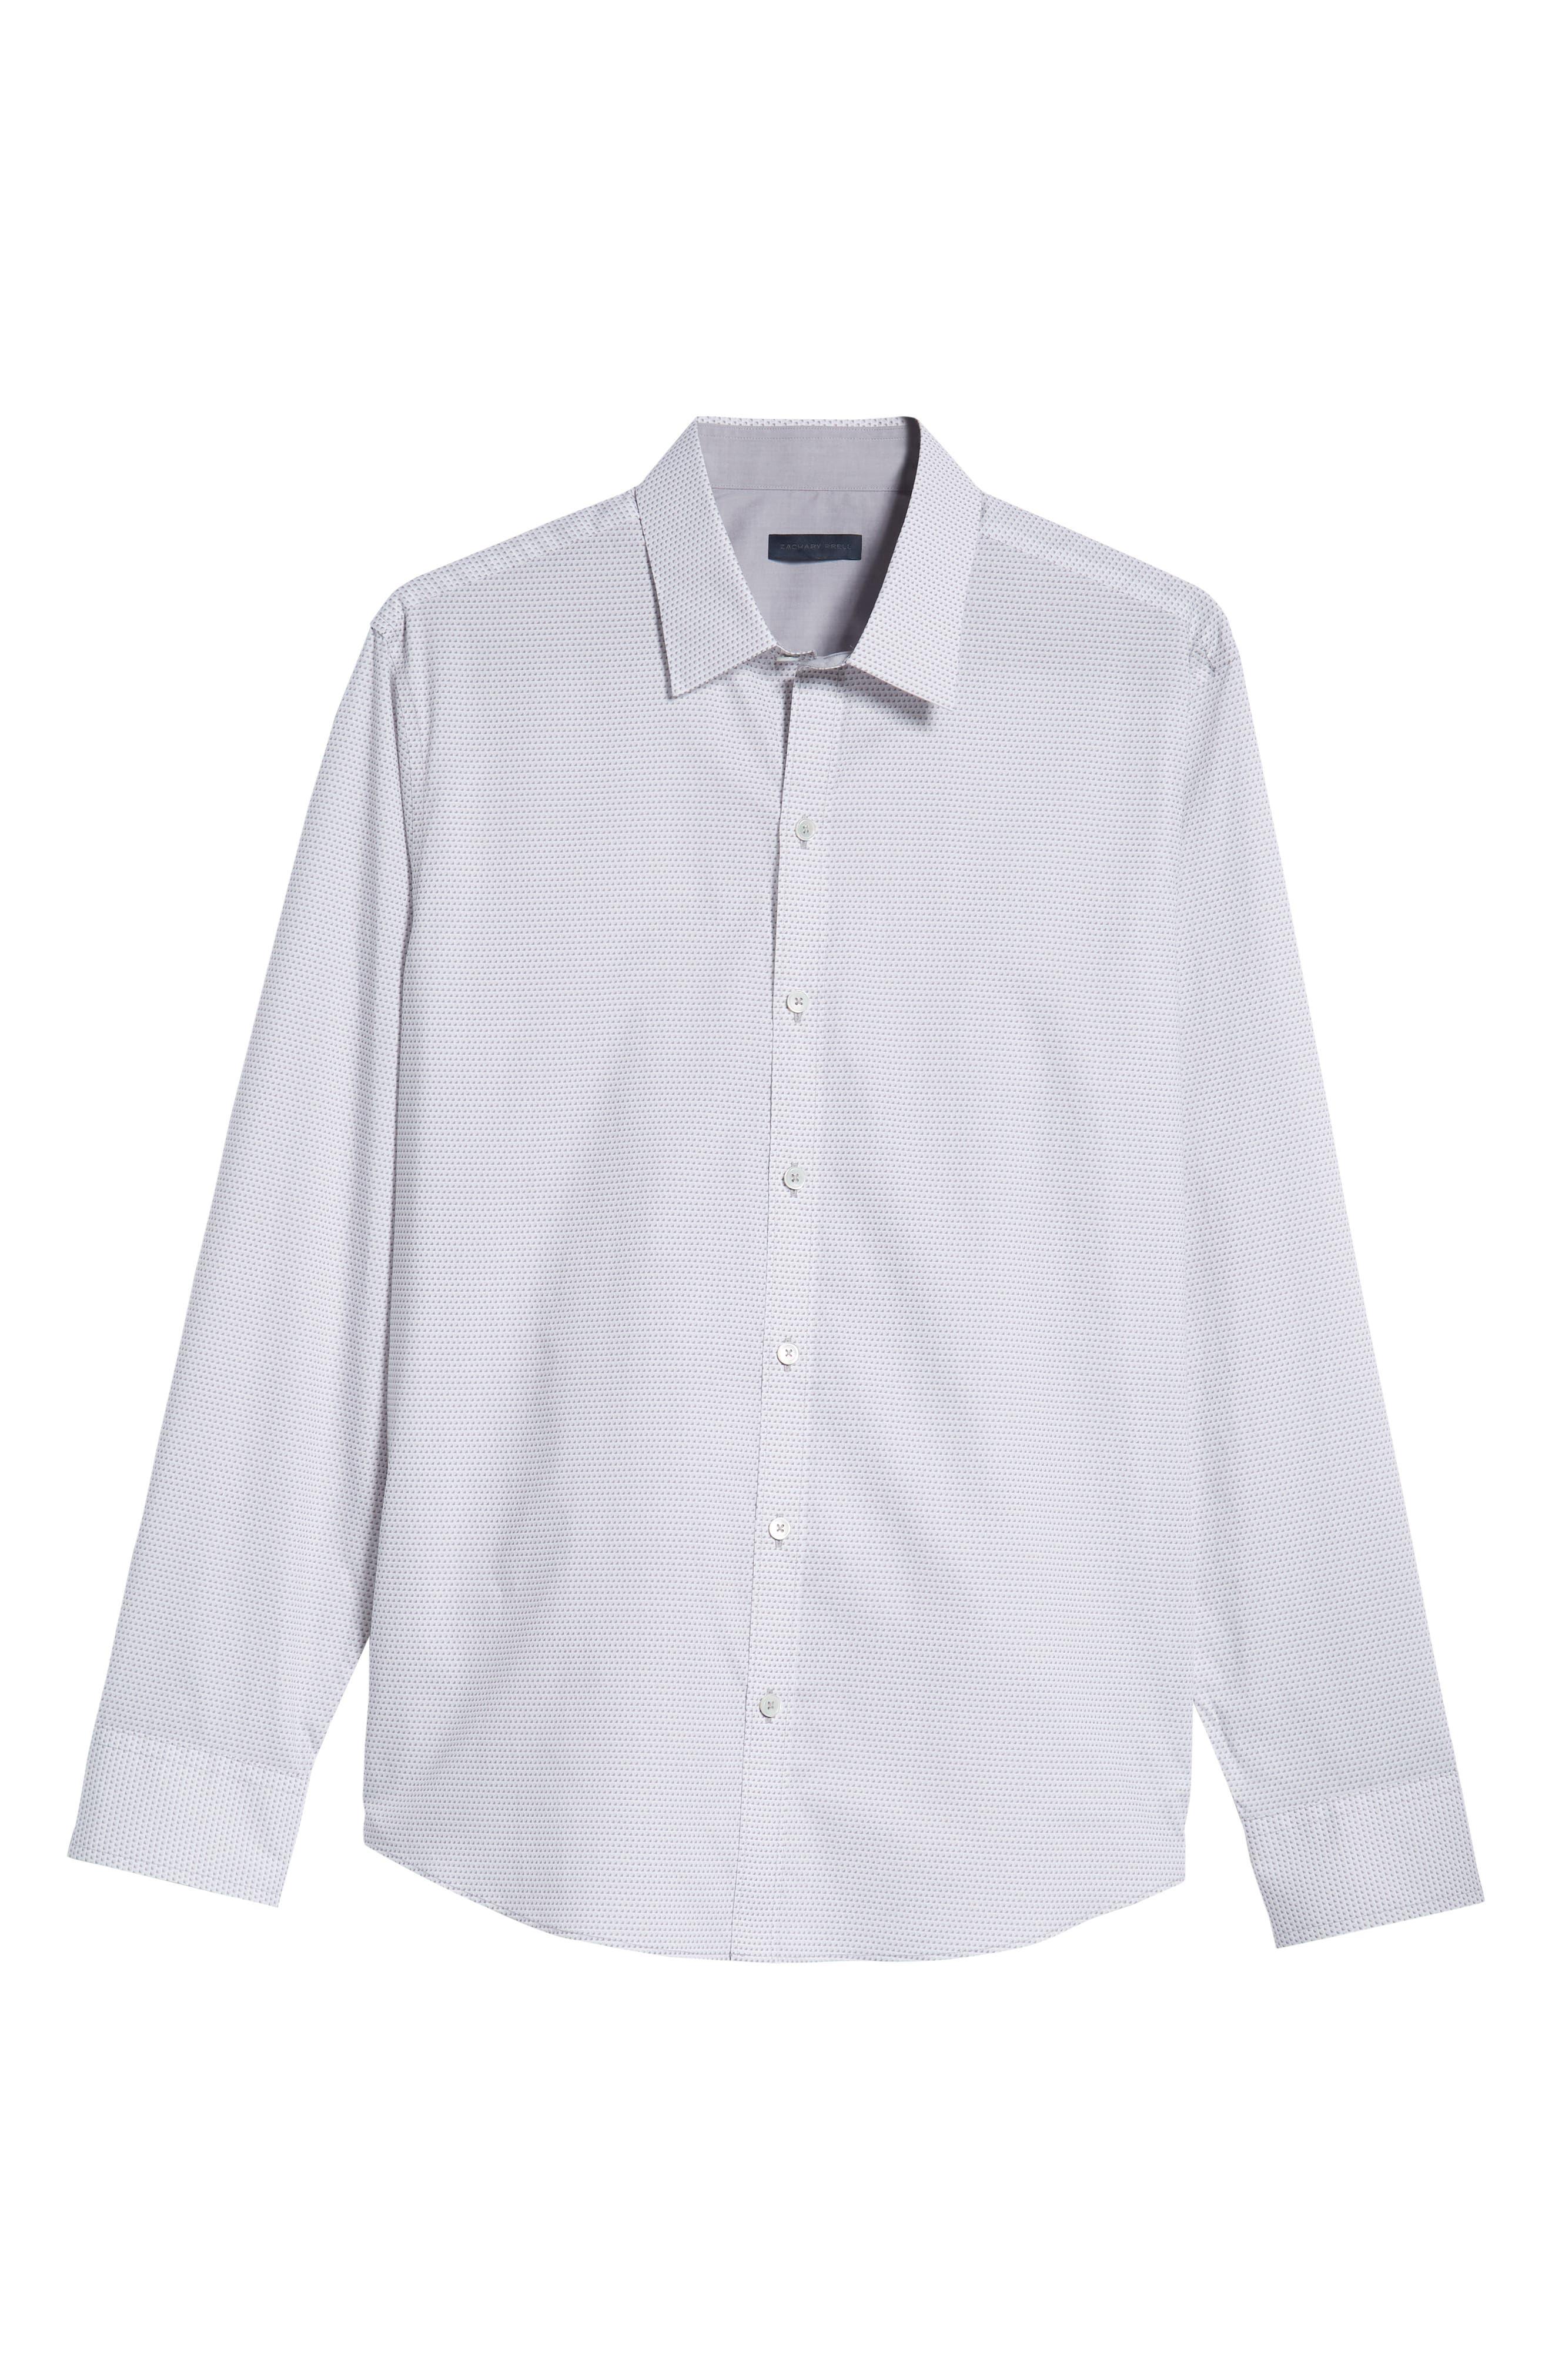 Toledo Regular Fit Microdot Sport Shirt,                             Alternate thumbnail 5, color,                             100